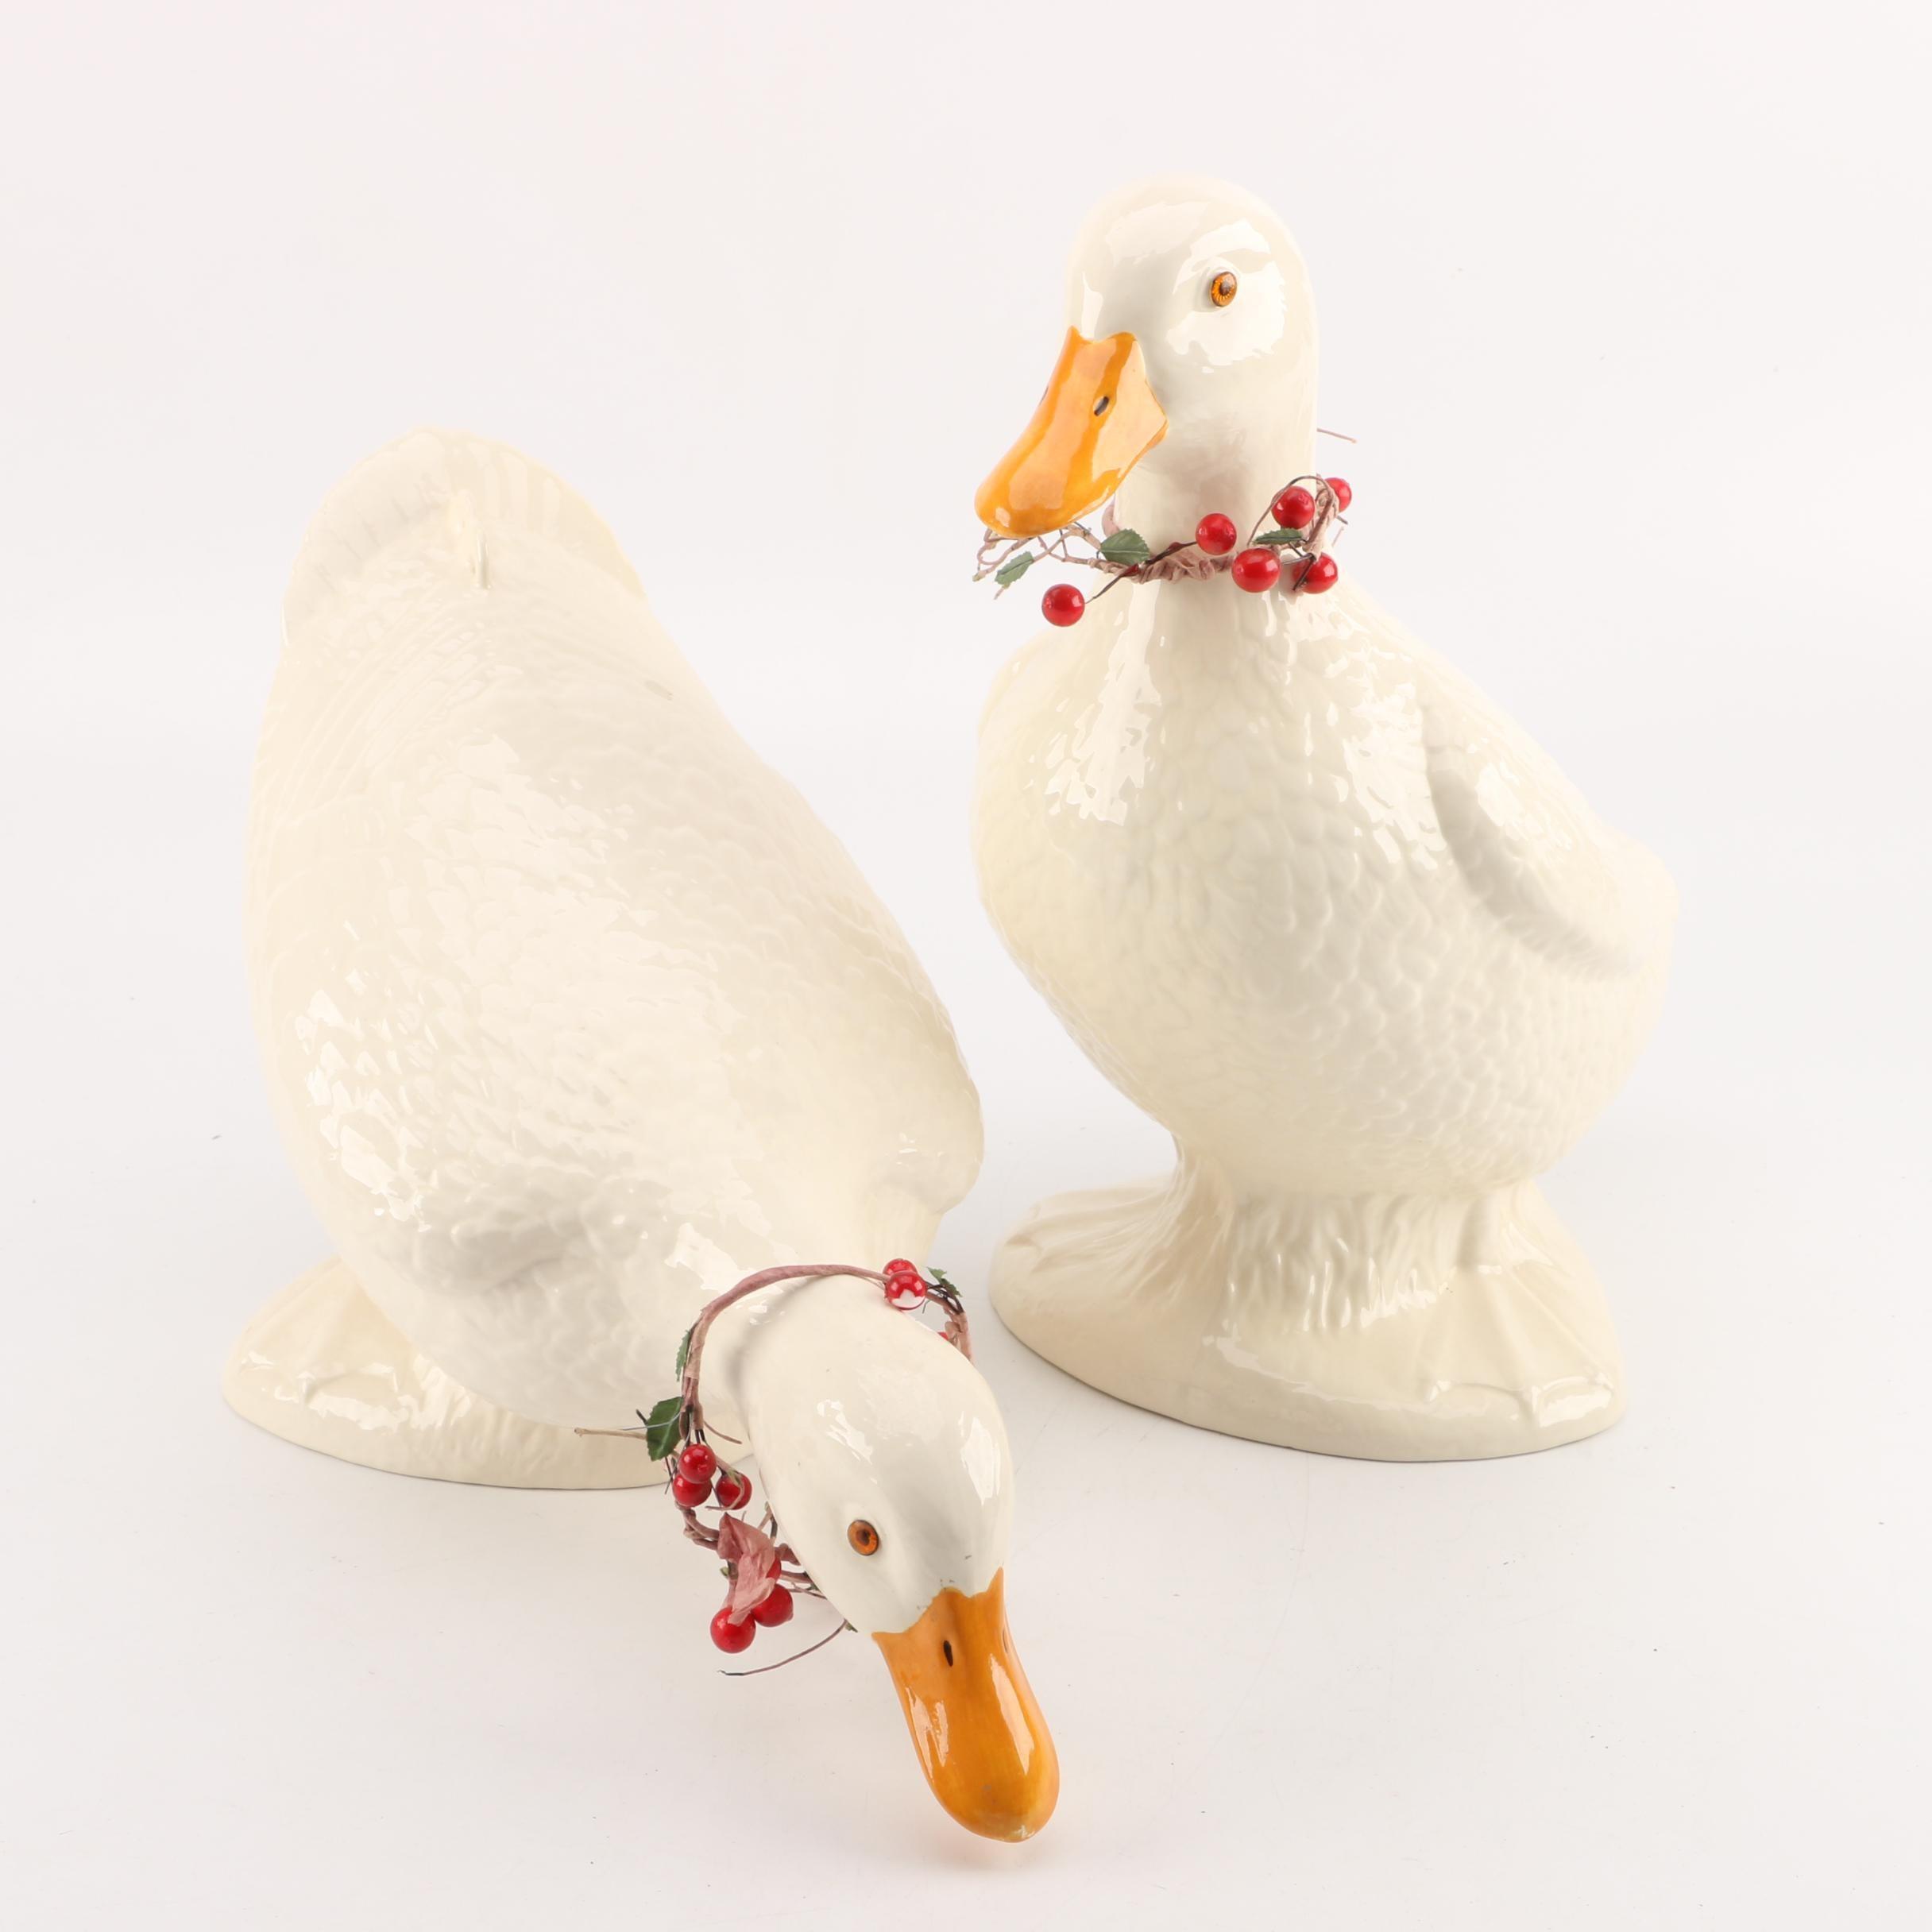 Vintage Hand-Painted Ceramic Duck Figurines